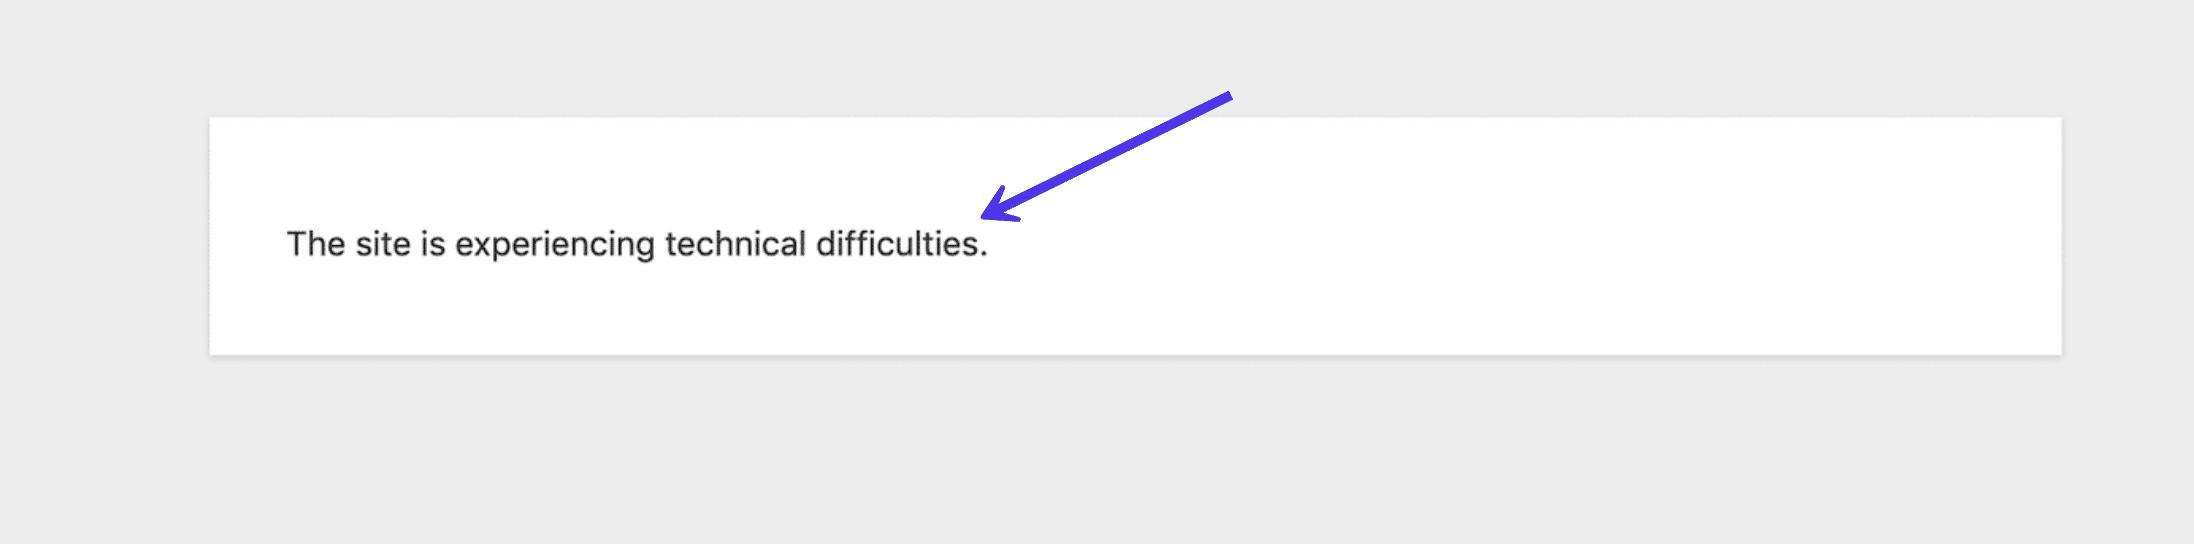 Mensaje de interfaz de WordPress max_execution_time